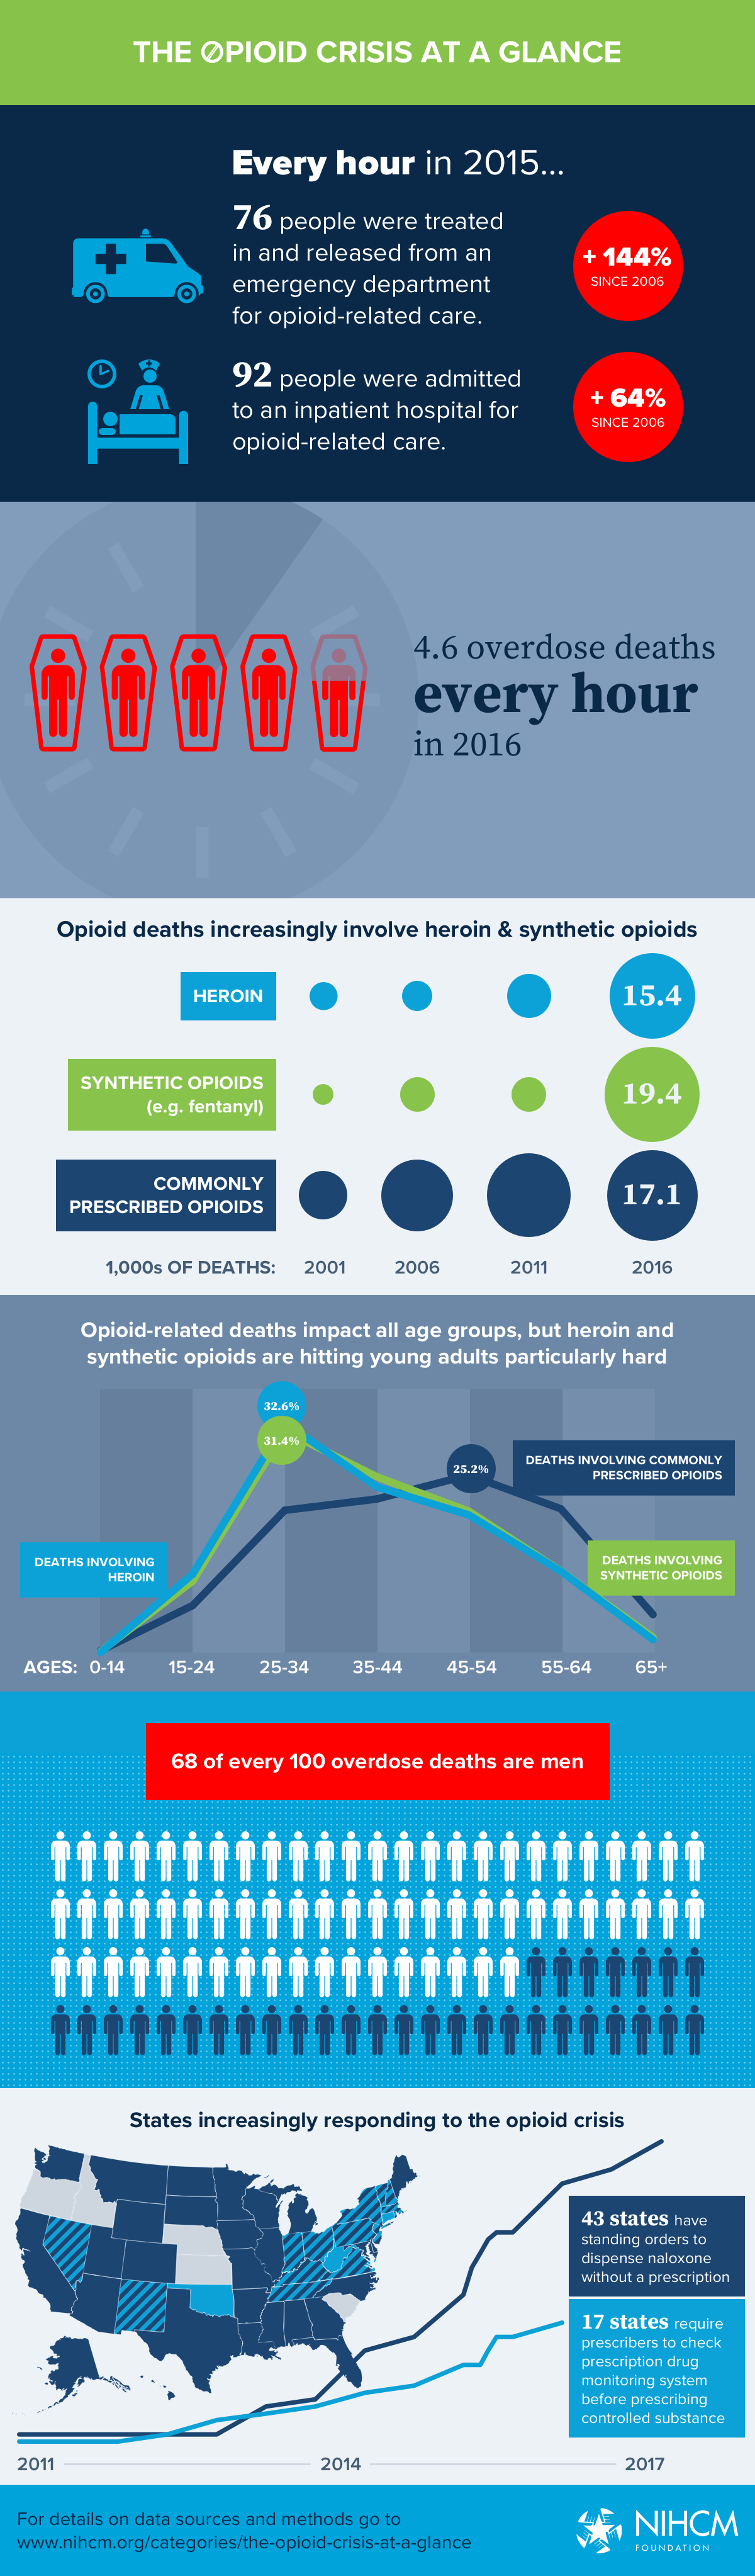 NIHCM-opioid-crisis-2018.jpg